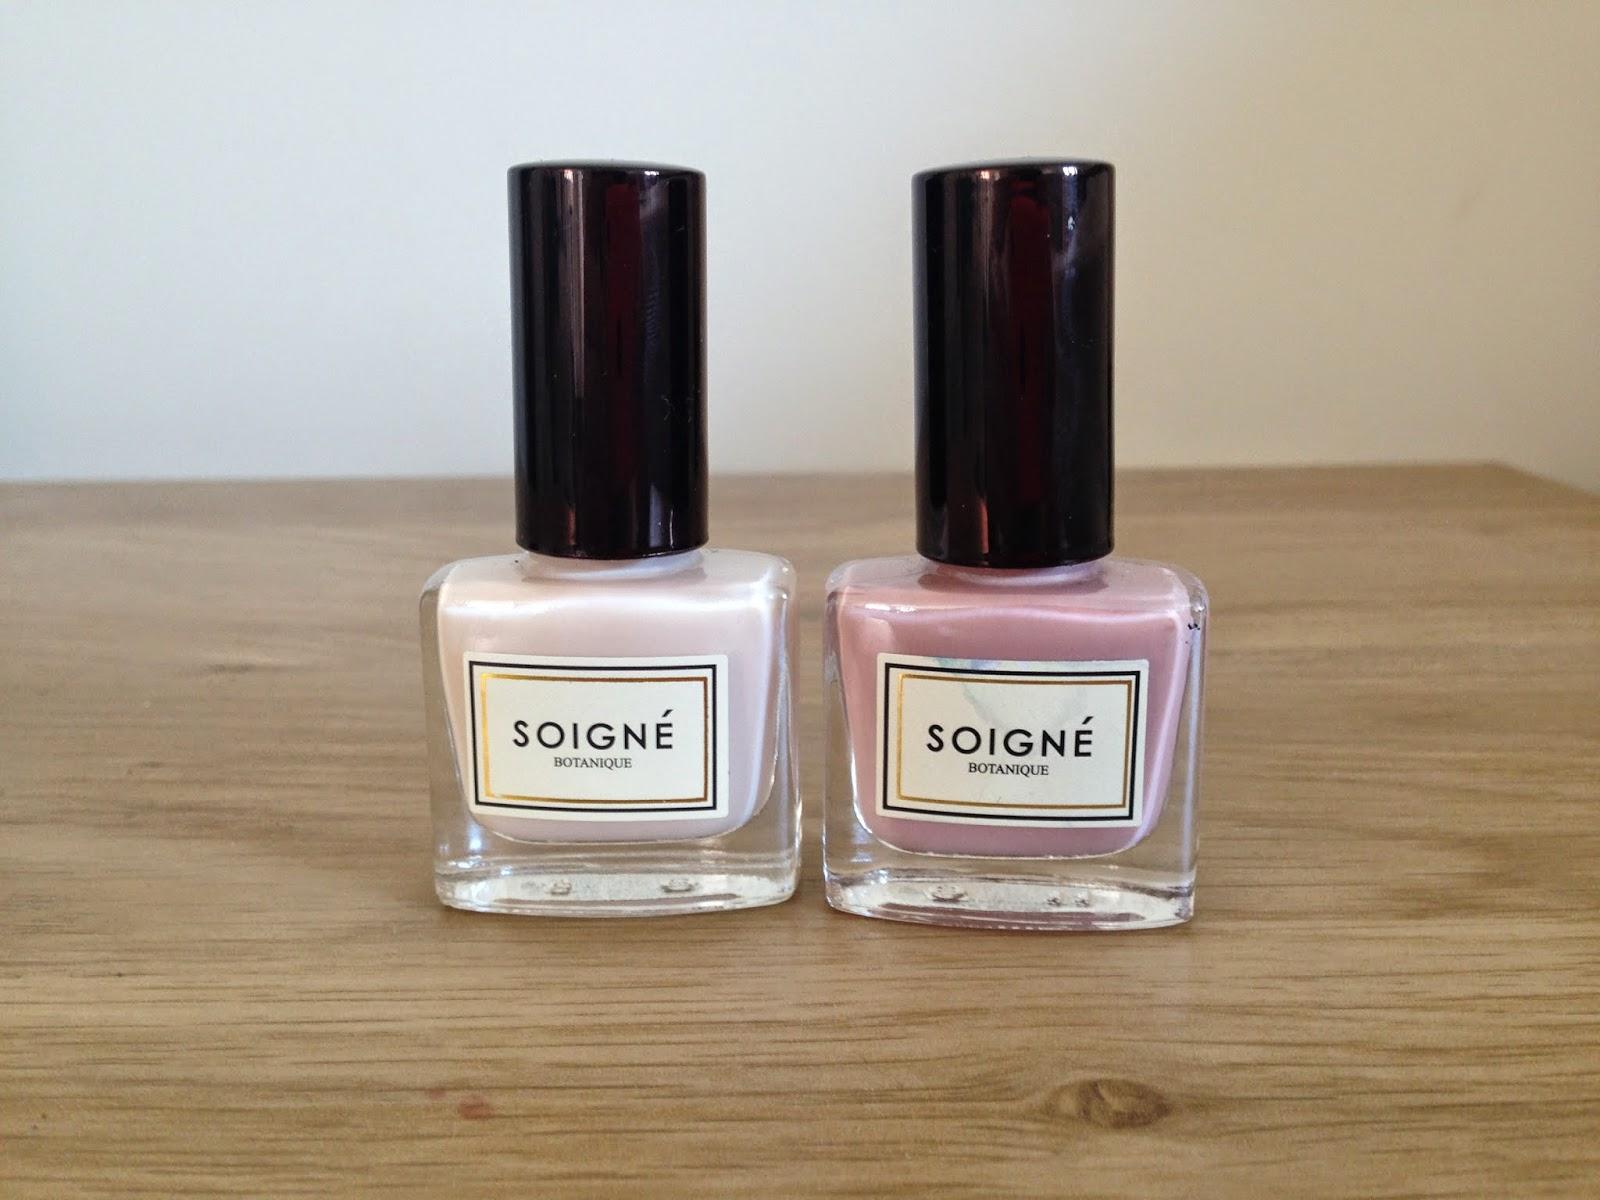 Soigne Nails French Manicure